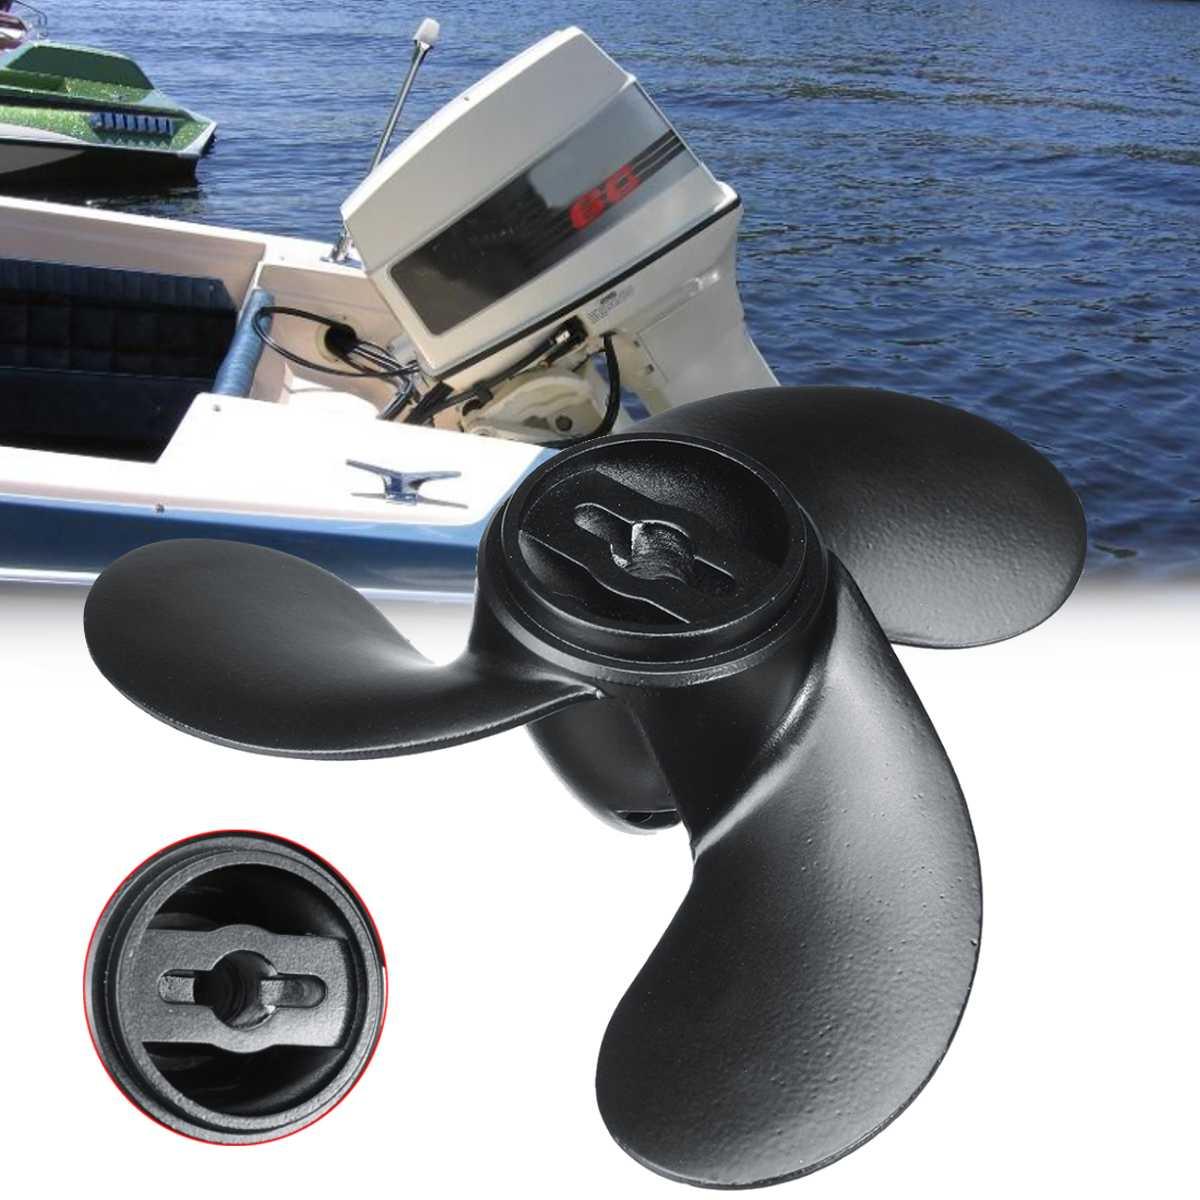 New 309-64106-0 Aluminum Marine Boat Propeller For Nissan Tohatsu Evinrude Johnson 2.2-3.3HP Black 3 Blades 7.4 X 5.7 R Rotation